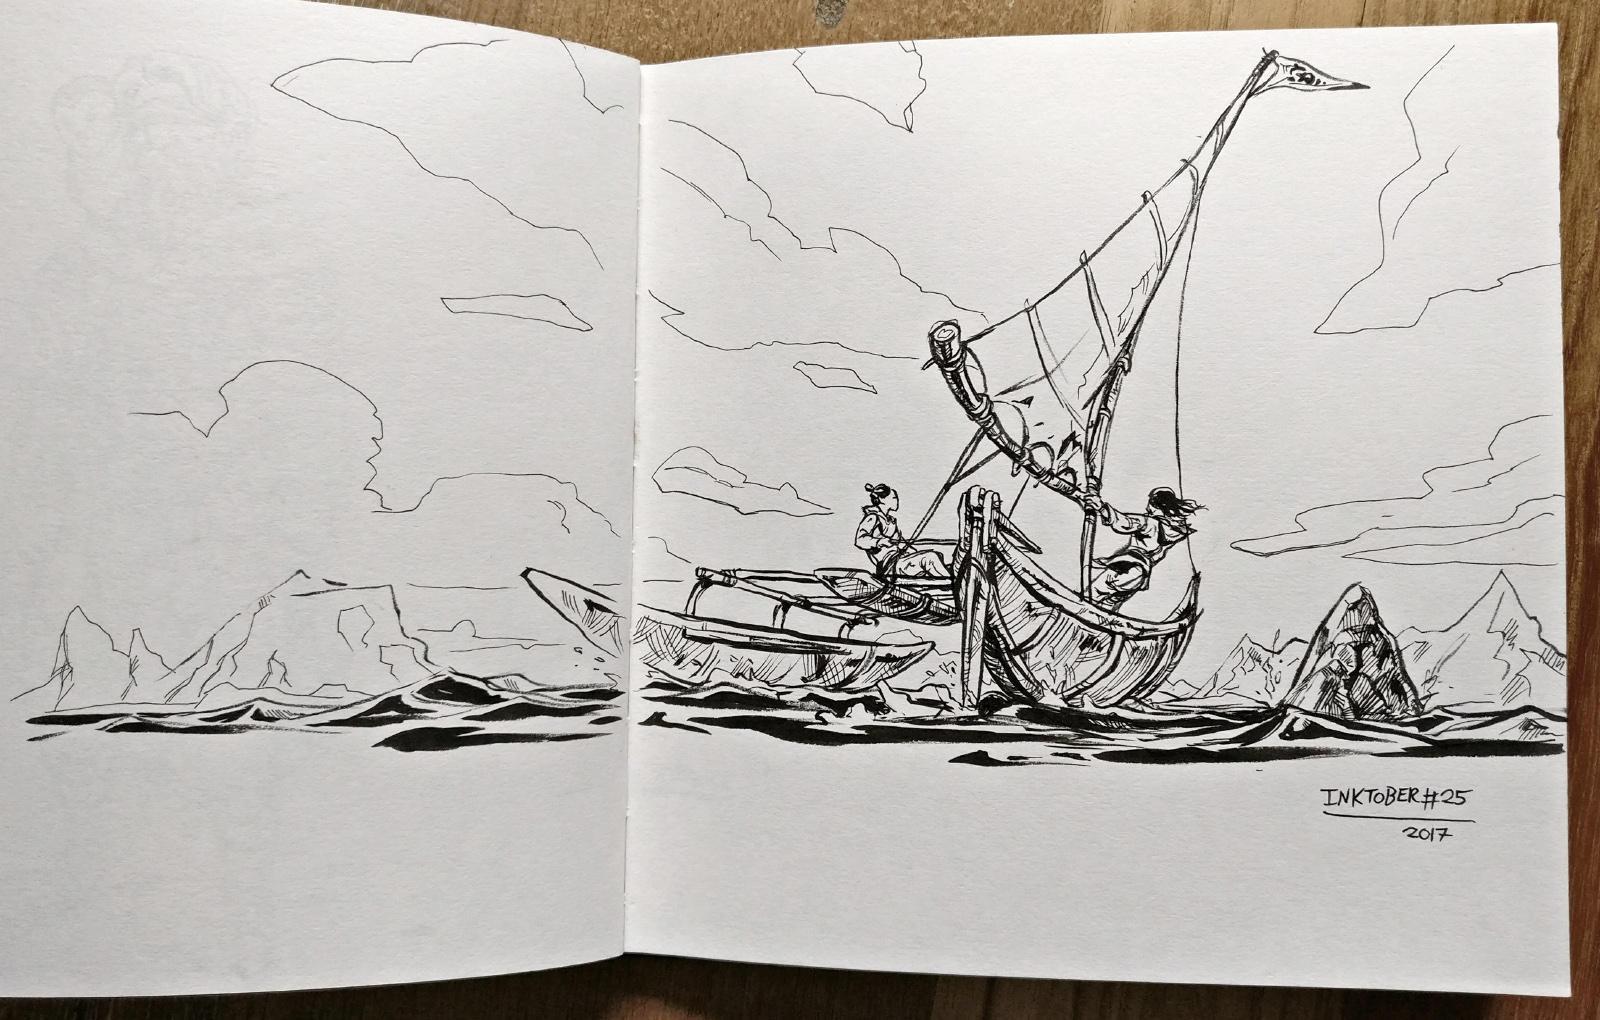 Inktober day 25: Ship! by Jordy-Knoop